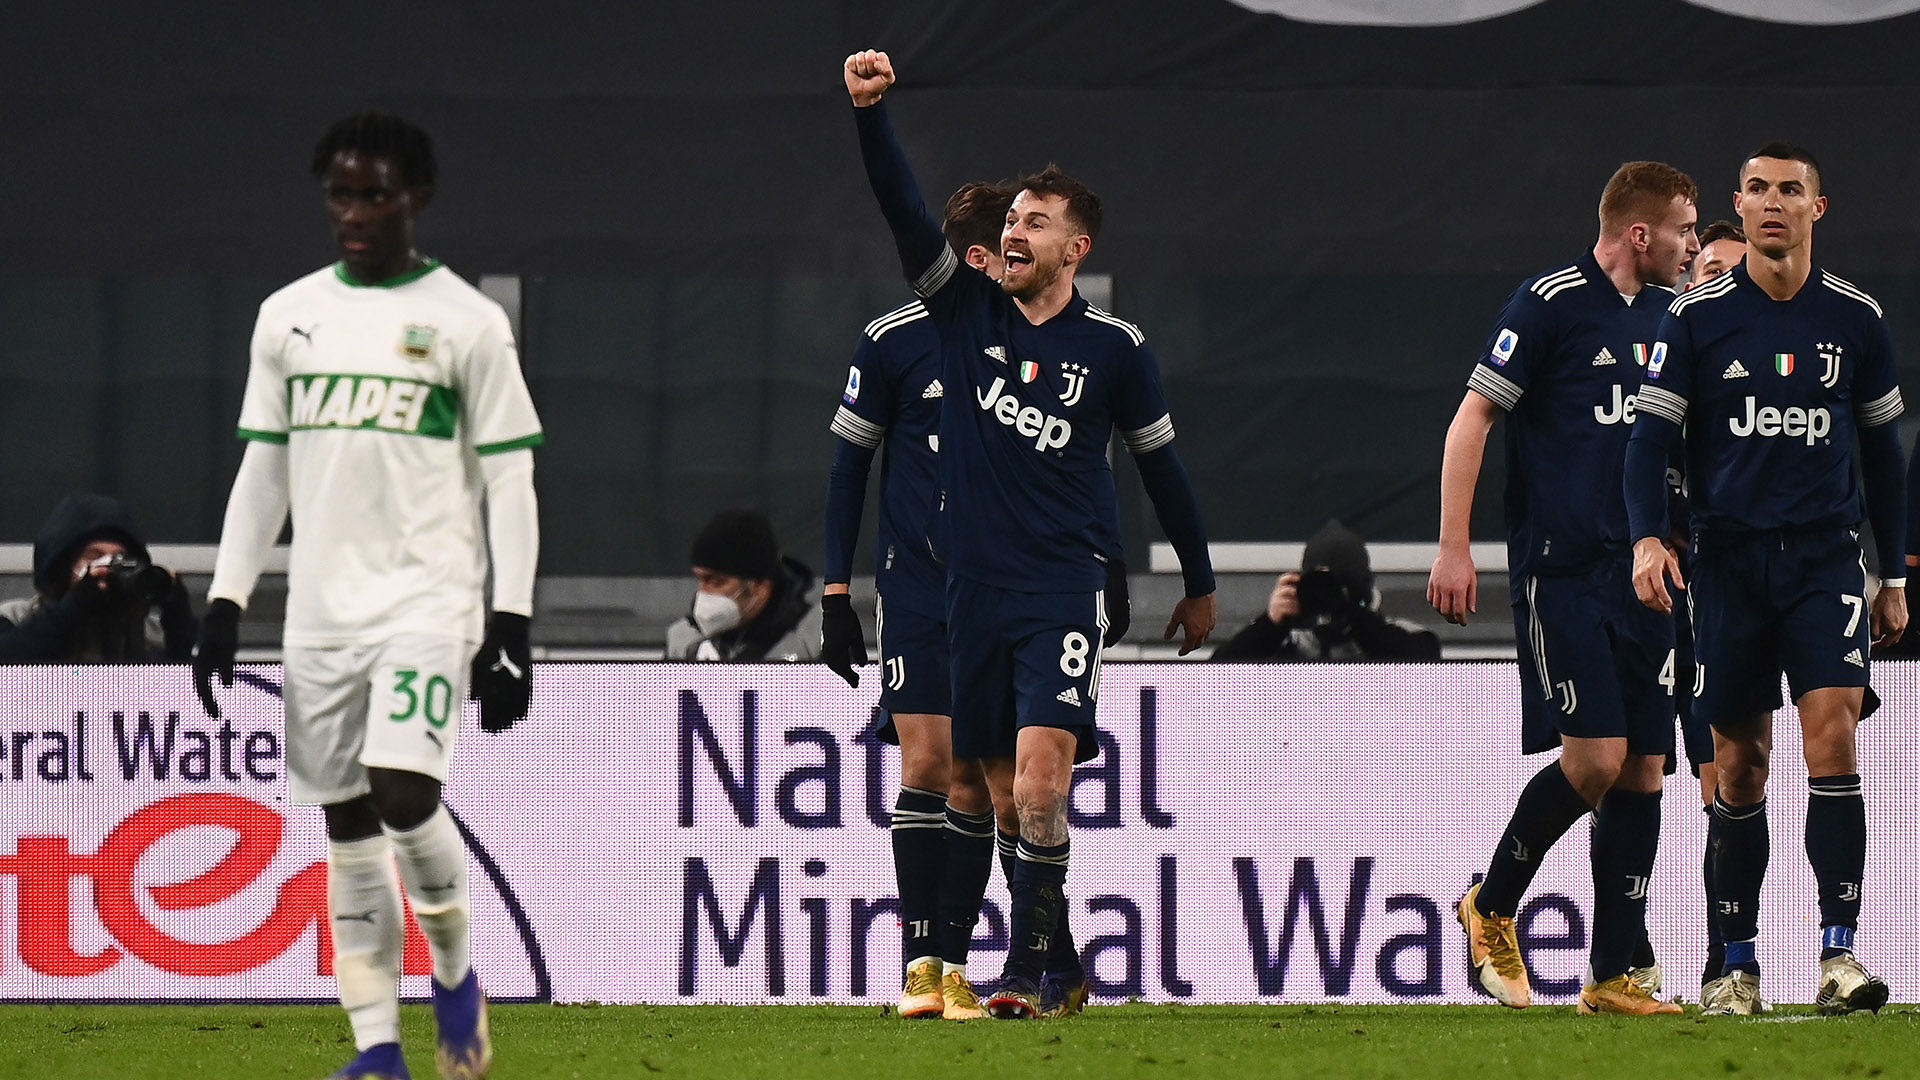 Serie A: Juventus-Sassuolo 3-1, le foto - Serie A: Juventus-Sassuolo 3-1,  le foto | Virgilio Sport